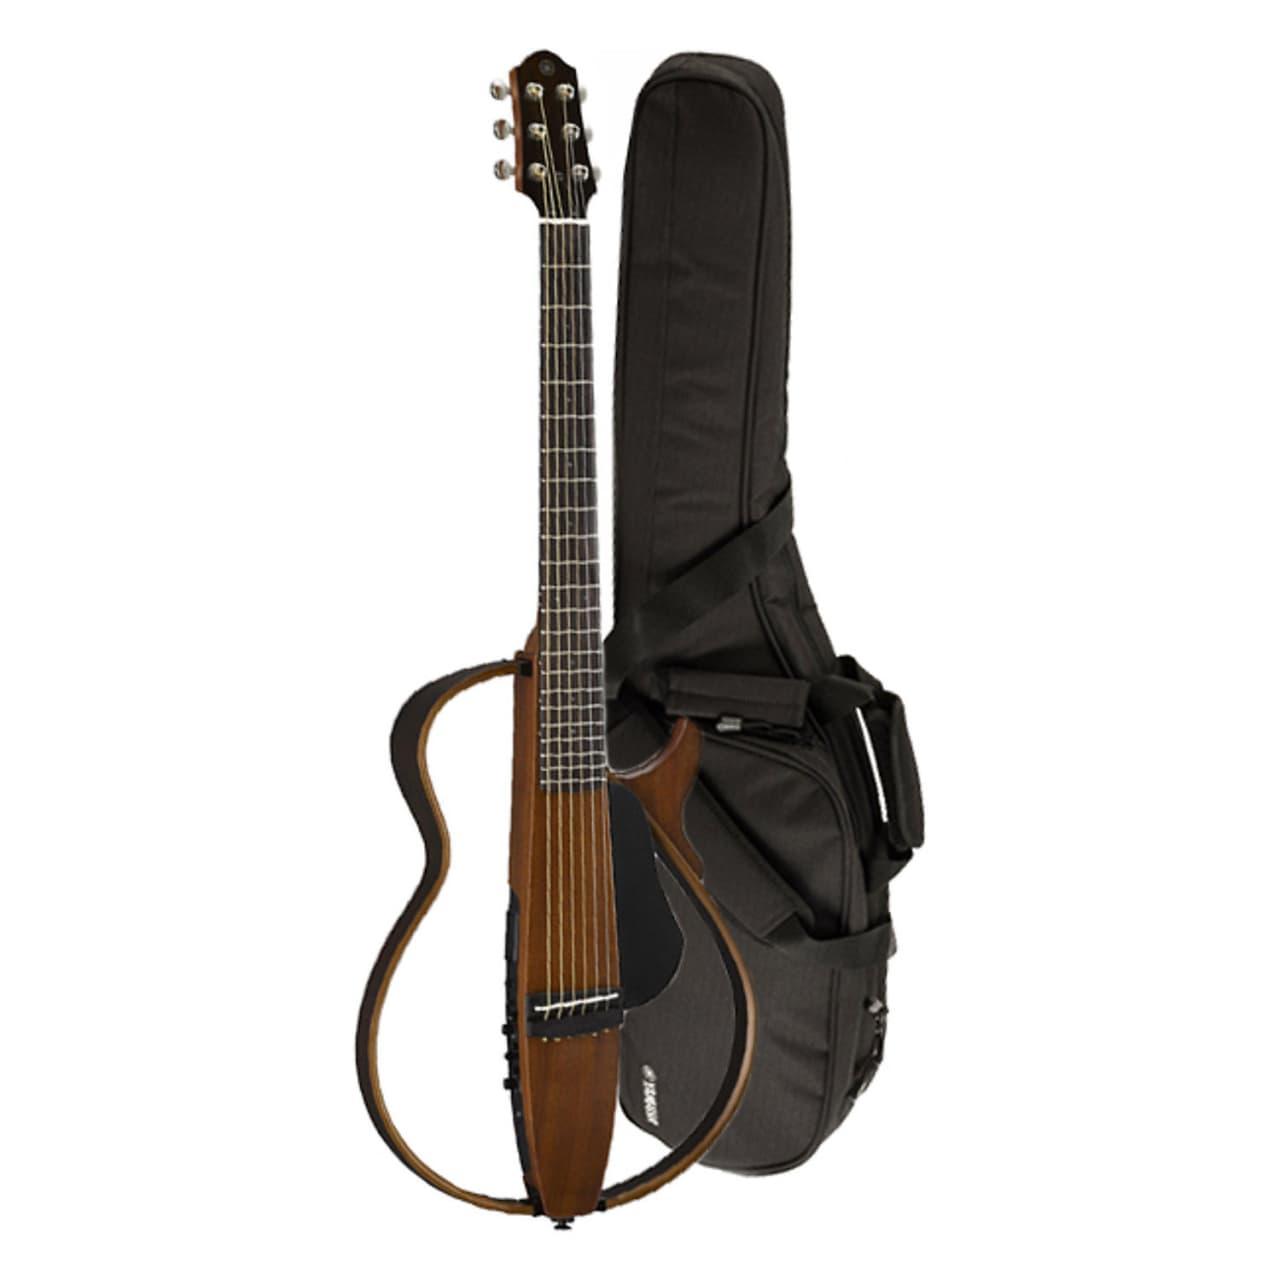 2015 yamaha slg200s nt steel string silent natural guitar for Yamaha slg200s steel string silent guitar